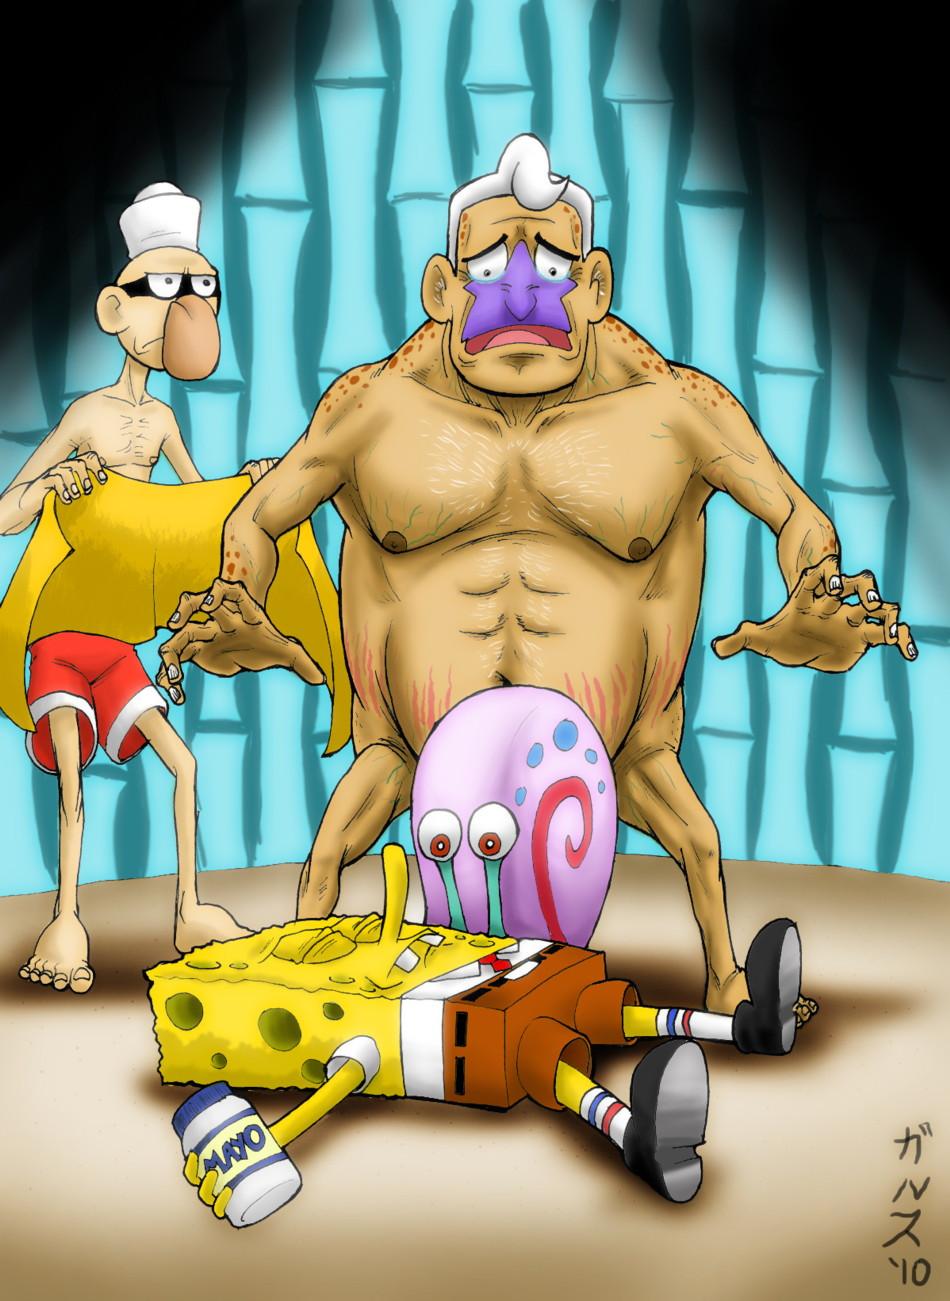 spongebob-porn-xxx-hentai-sexy-strip-tease-big-boobs